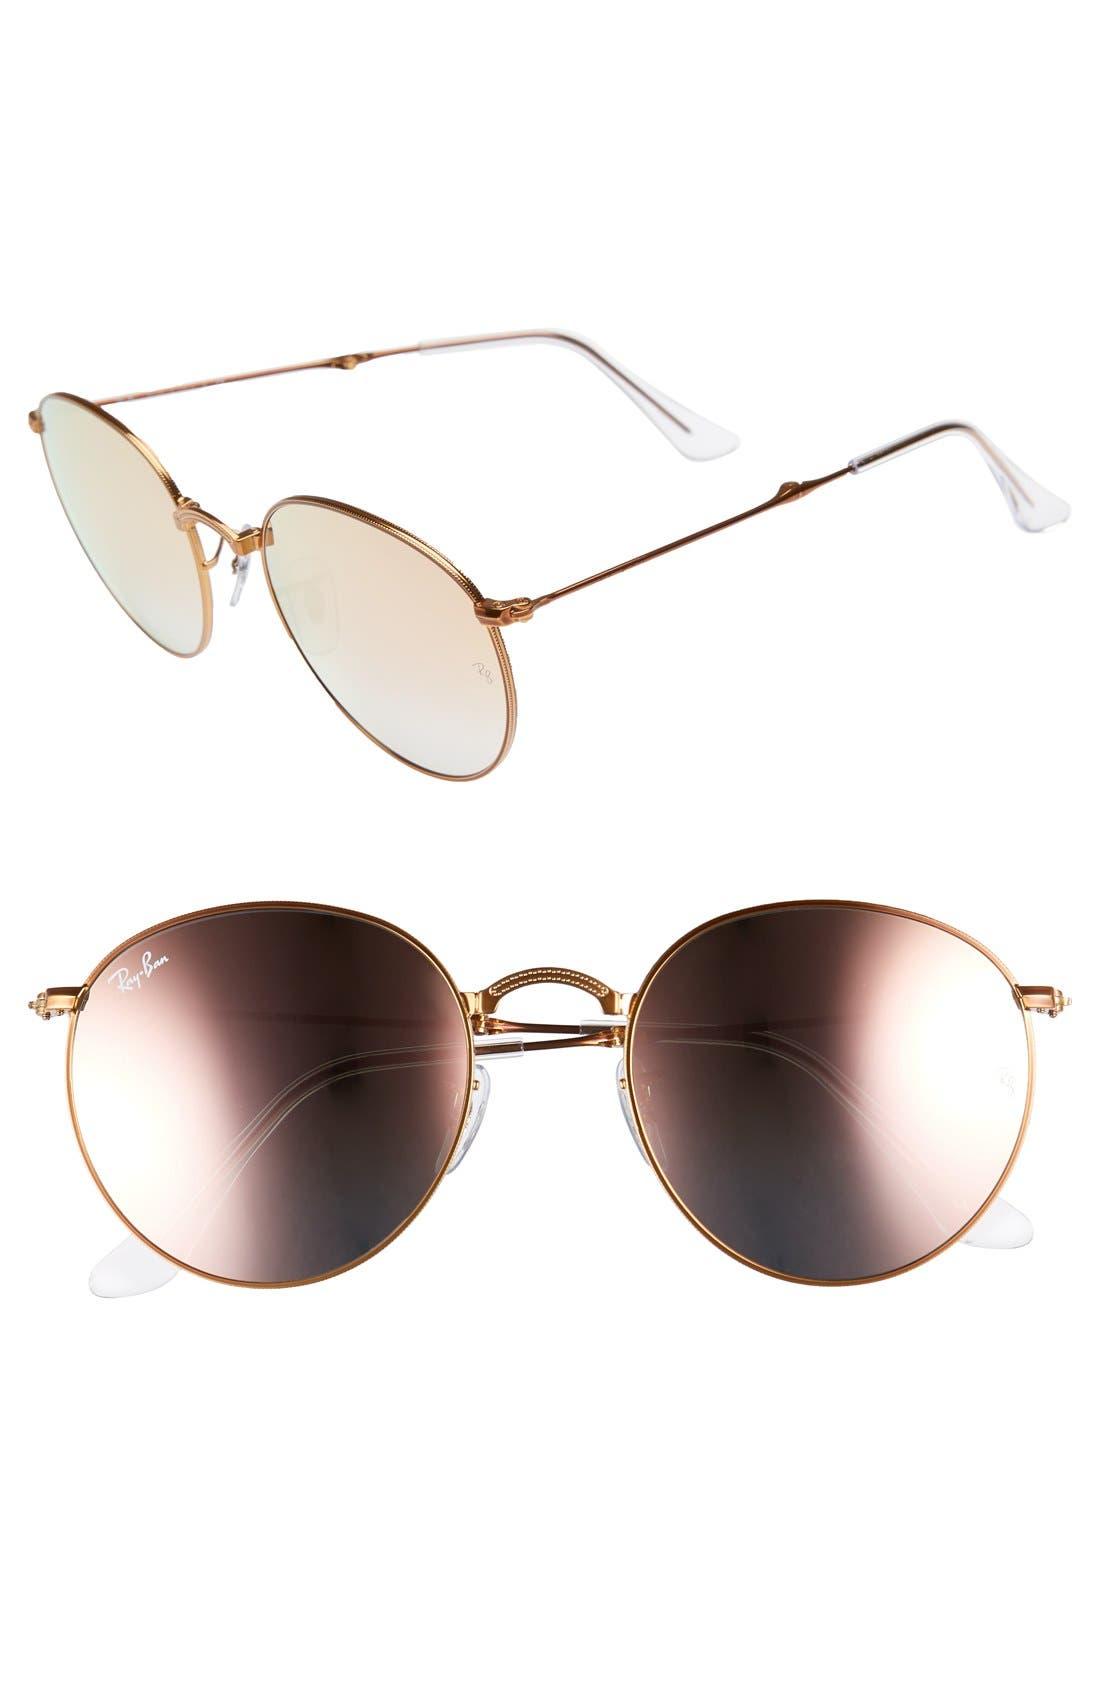 Main Image - Ray-Ban Icons 53mm Folding Round Sunglasses